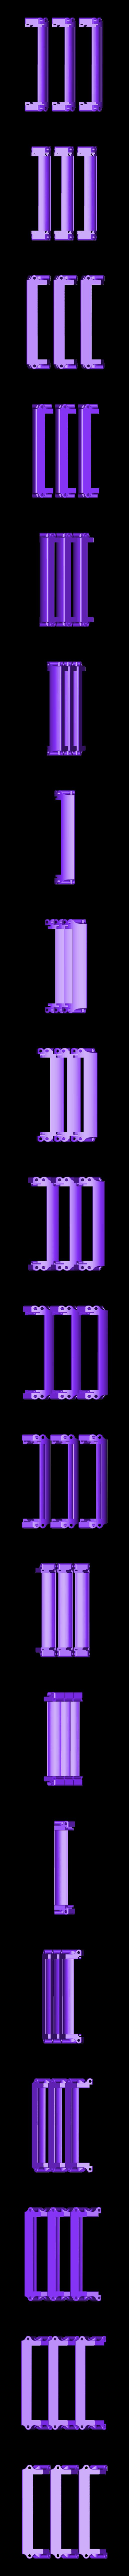 Set_14500_Mx3.stl Download free STL file Battery holder for 3x 14500, AA • 3D printer template, SiberK